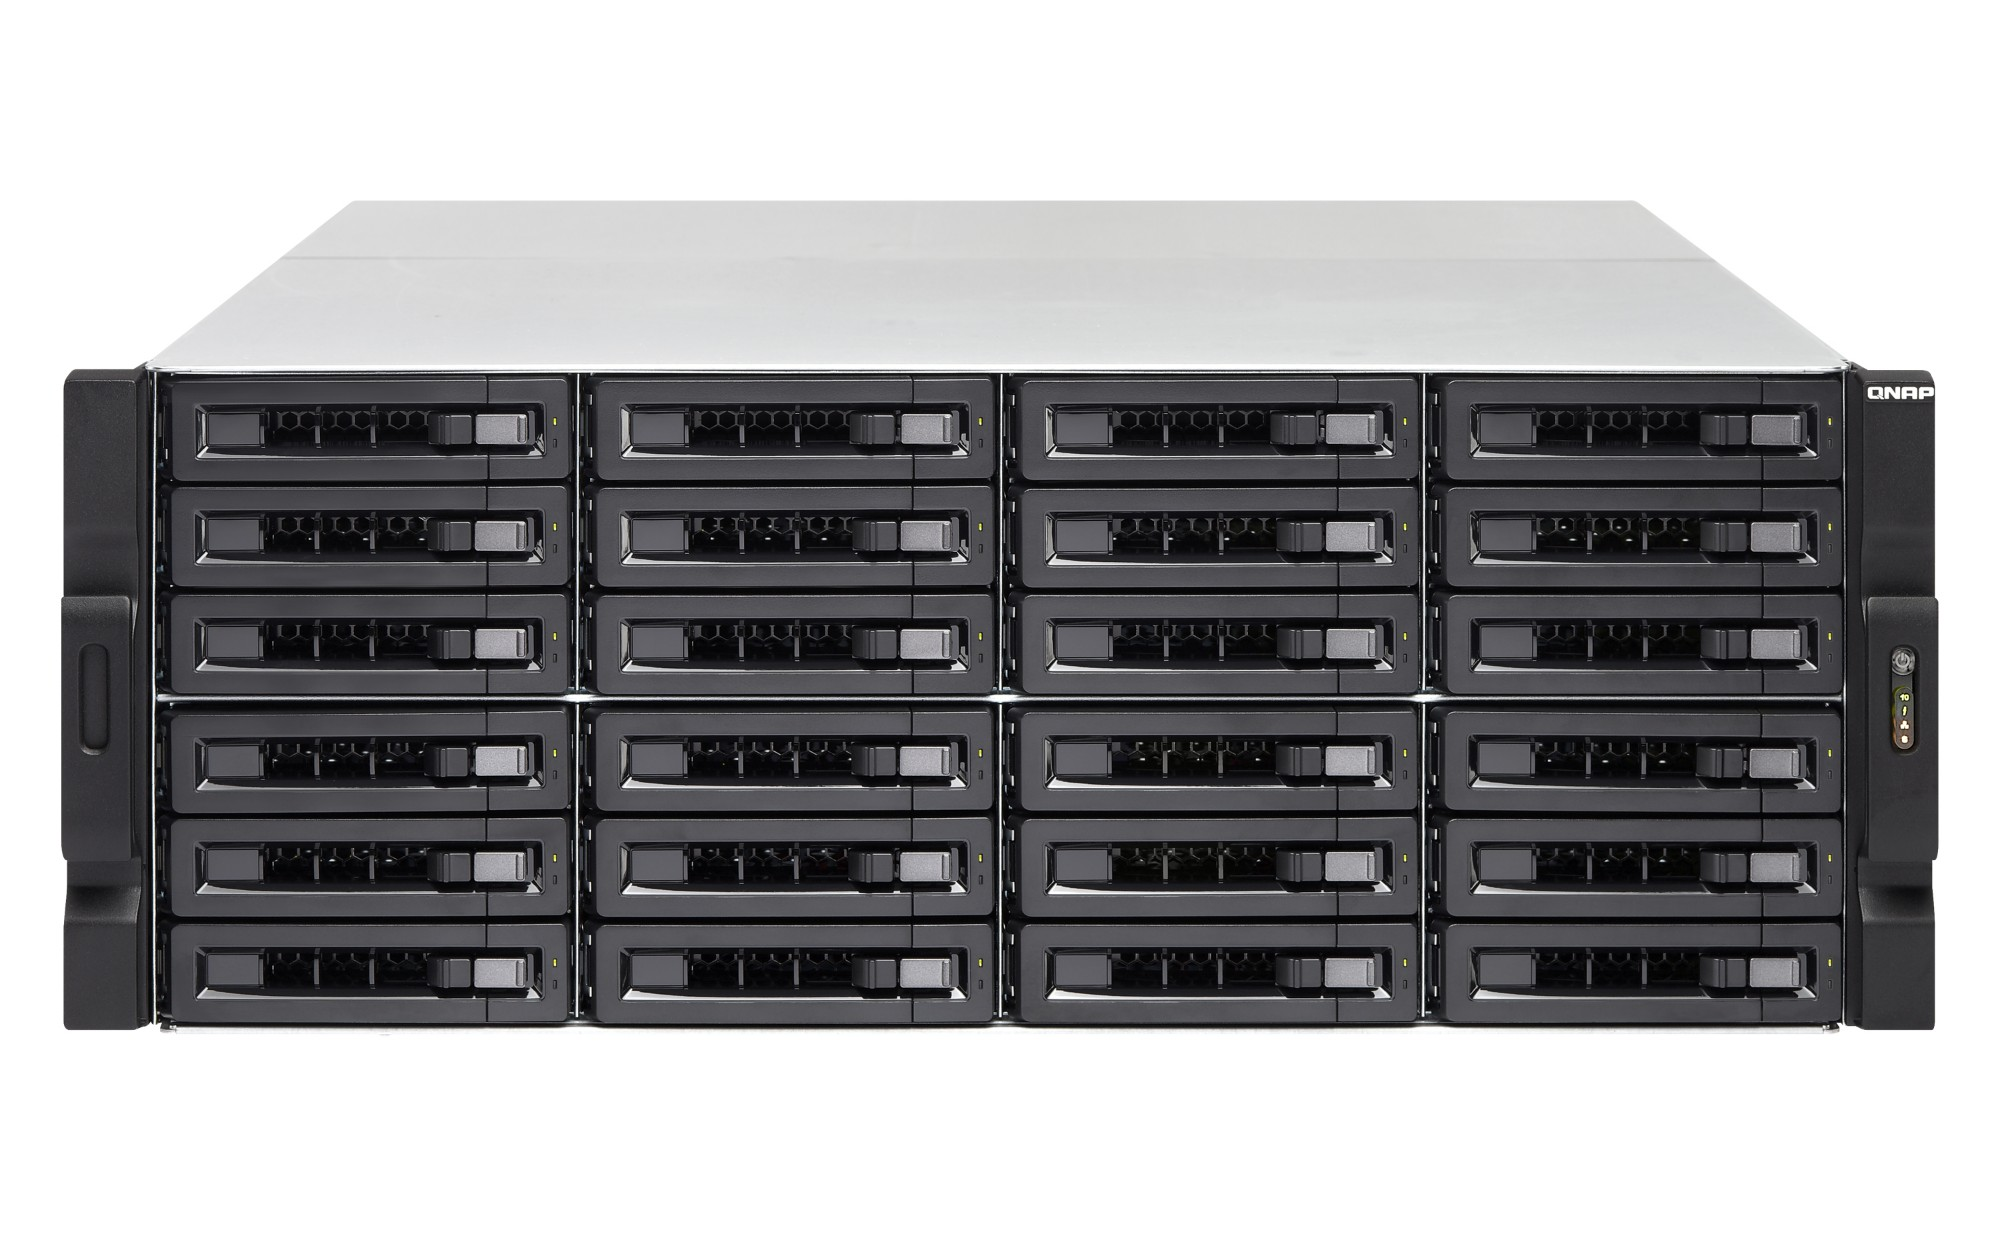 QNAP TS-EC2480U R2 NAS Rack (4U) Ethernet LAN Black,Grey